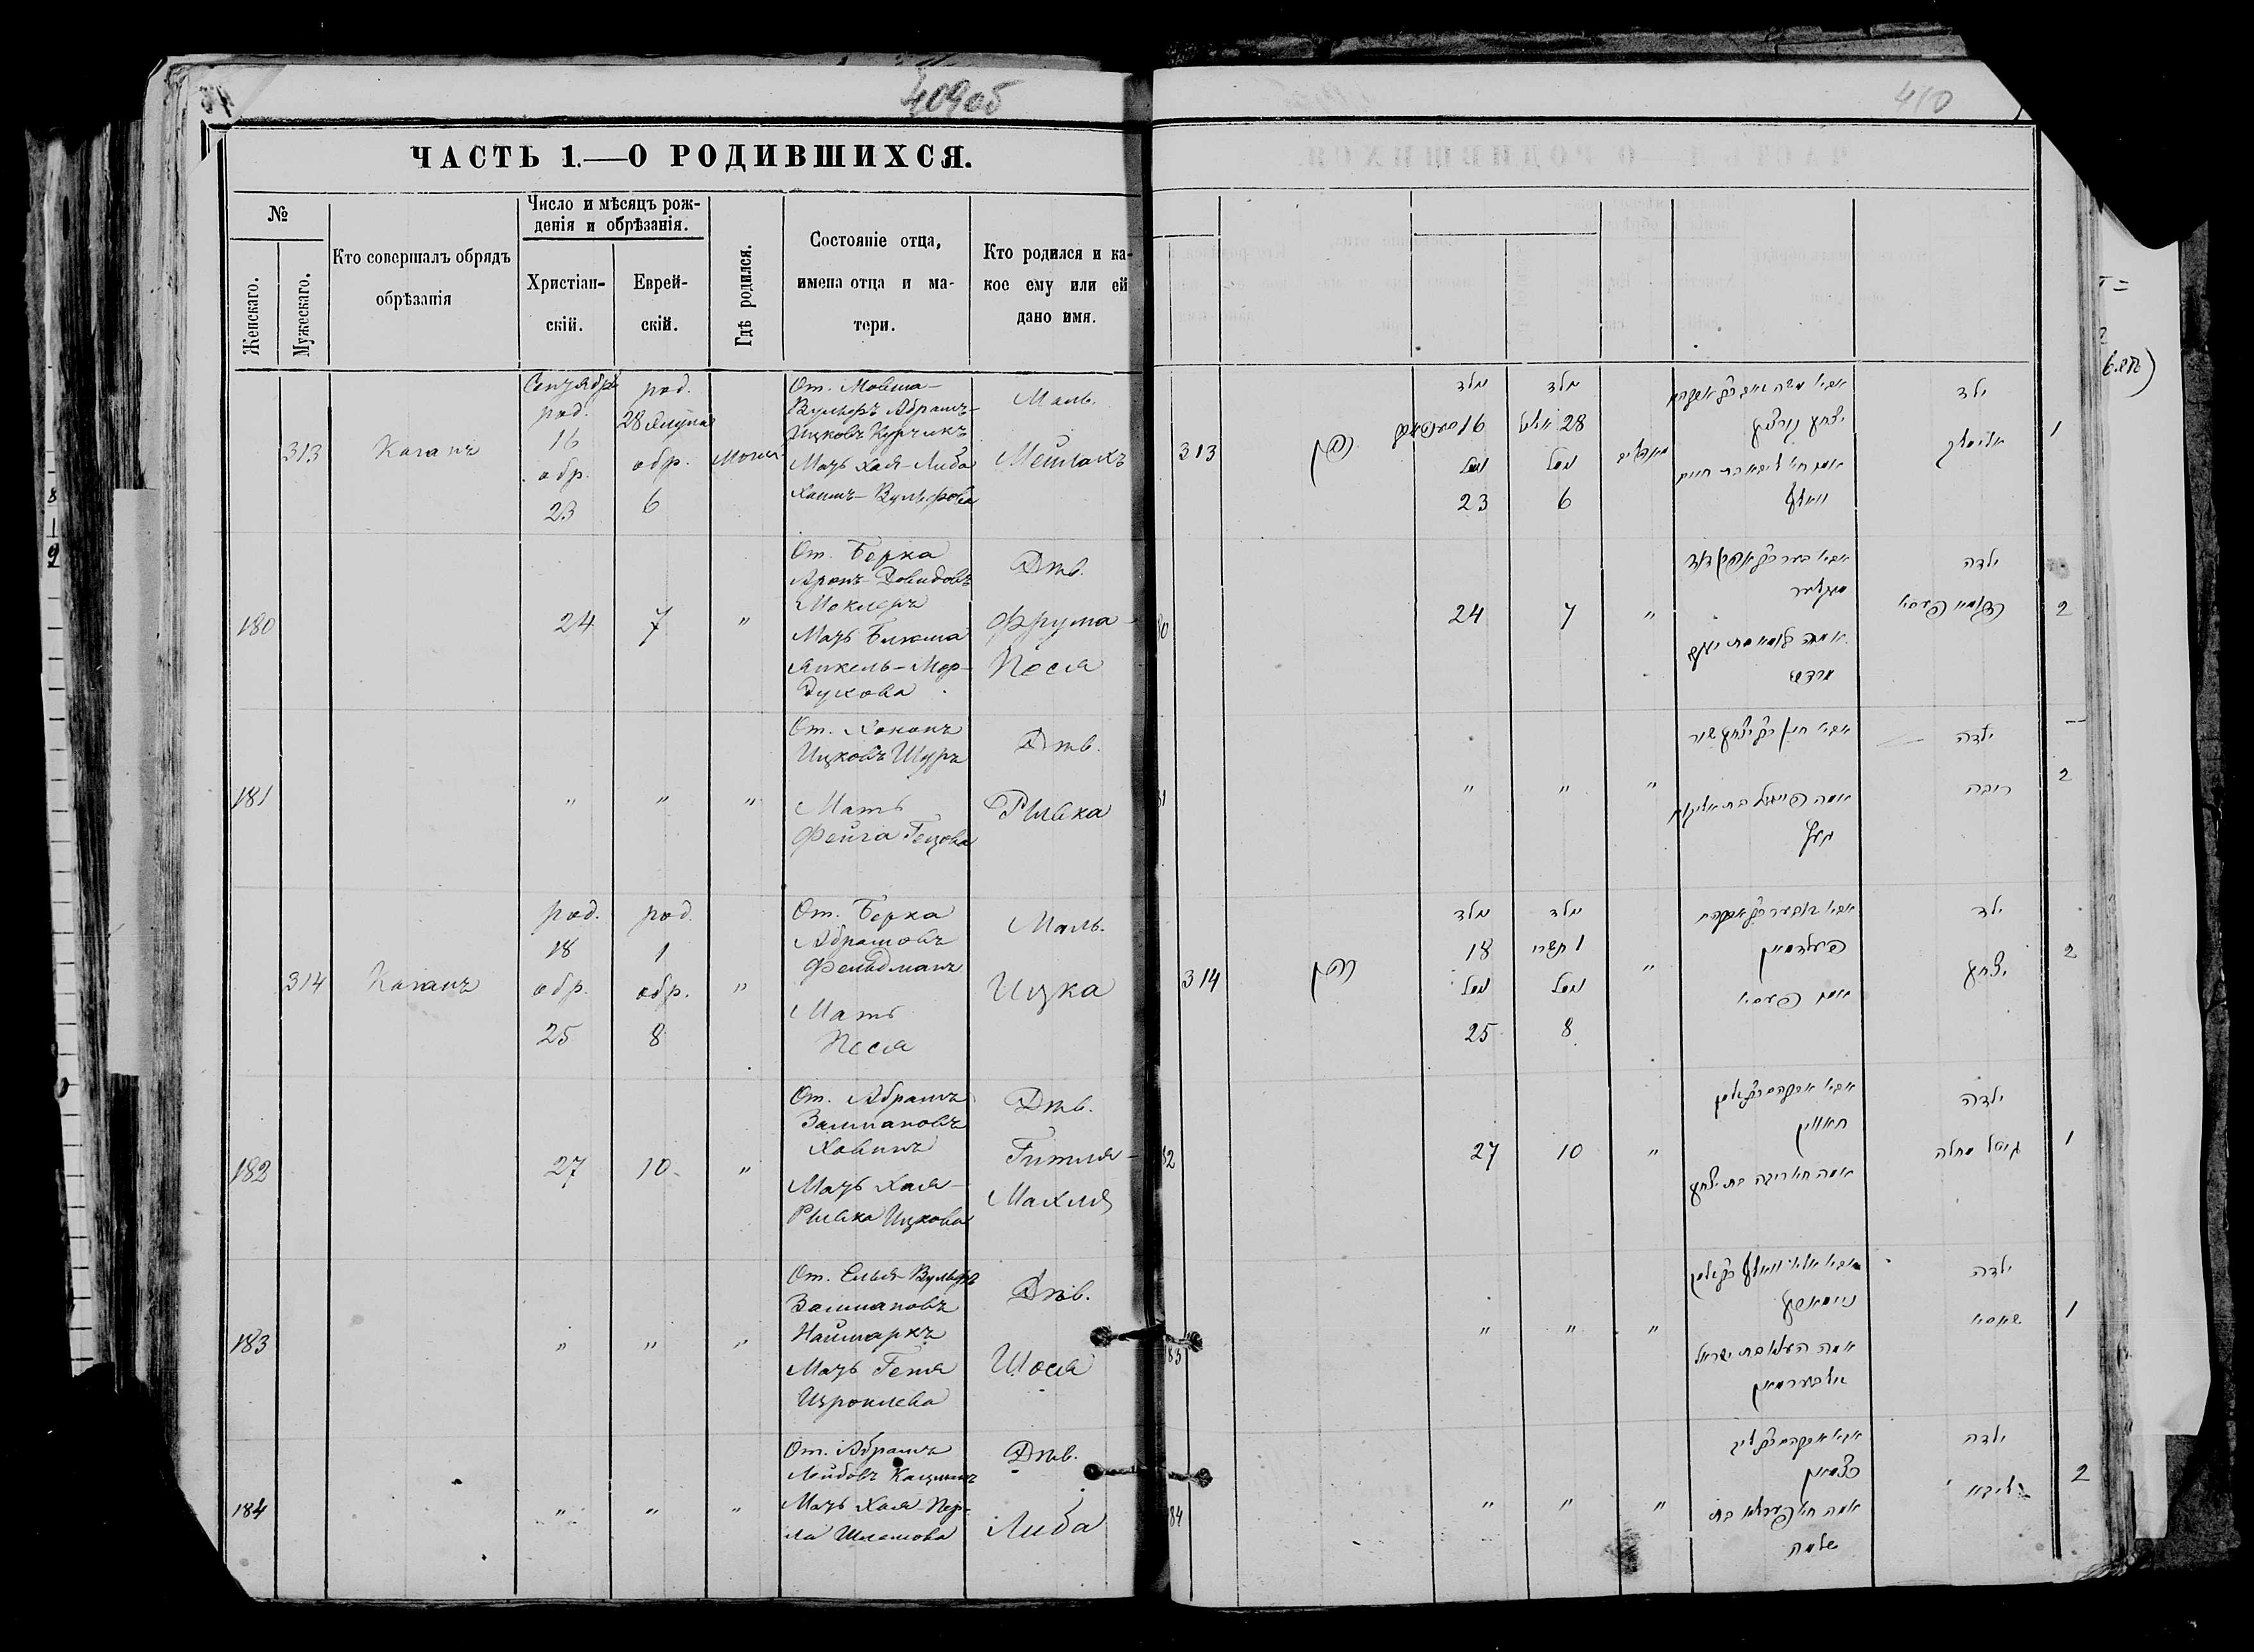 Мейлах (Элимелах) Вульфович Курчик 16 сентября 1875, запись 313, пленка 007766481, снимок 82